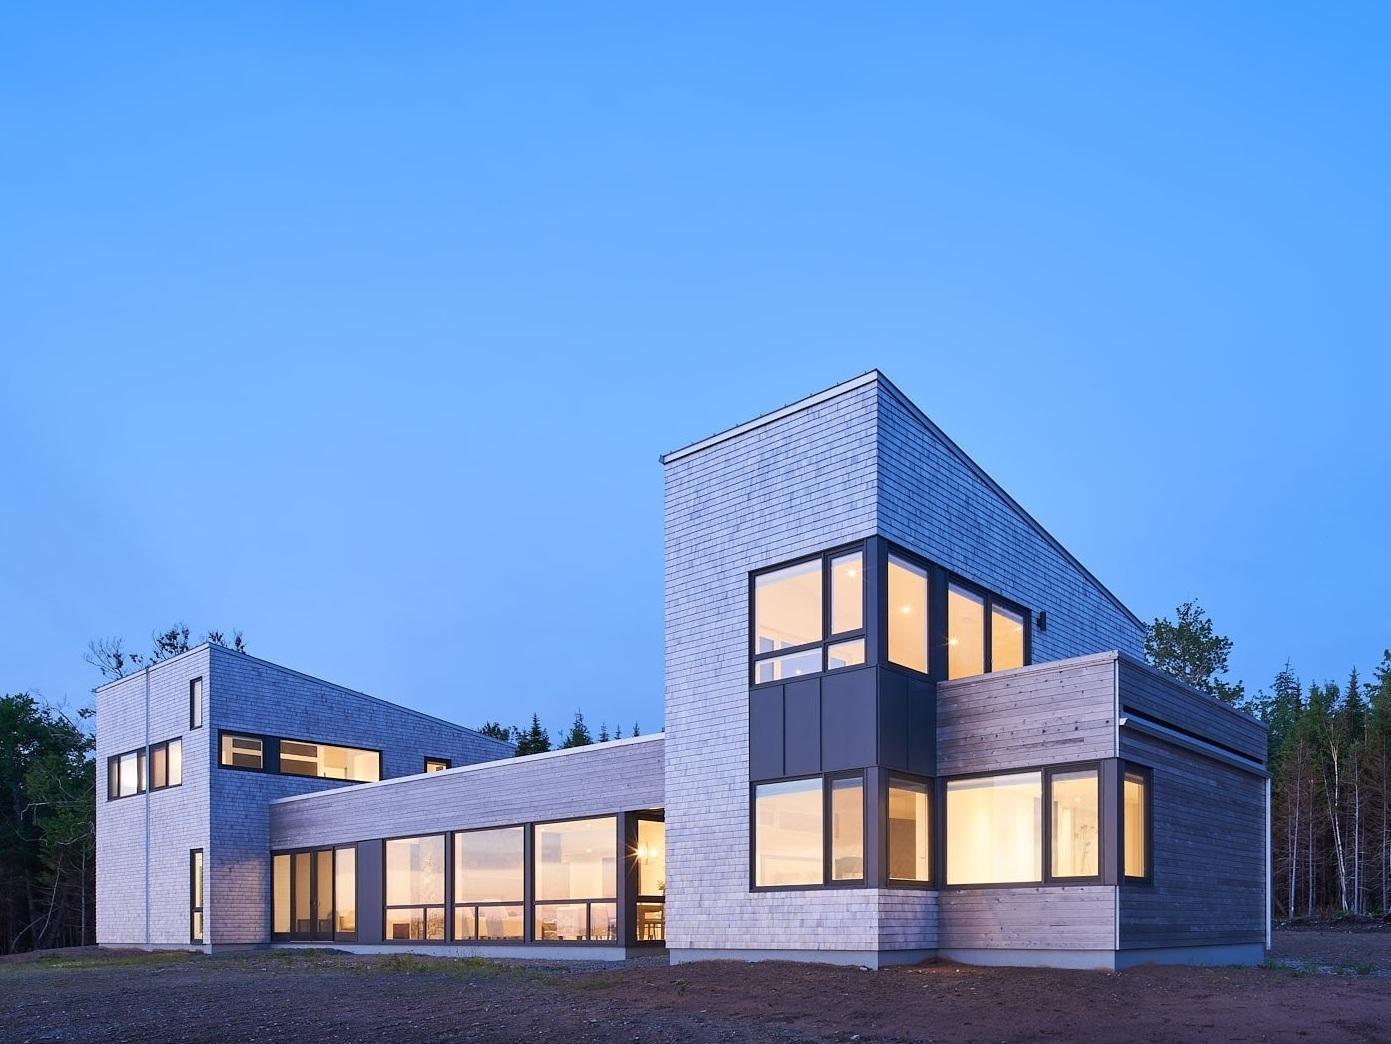 ABACUS HOUSE - CAPE BRETON, NS